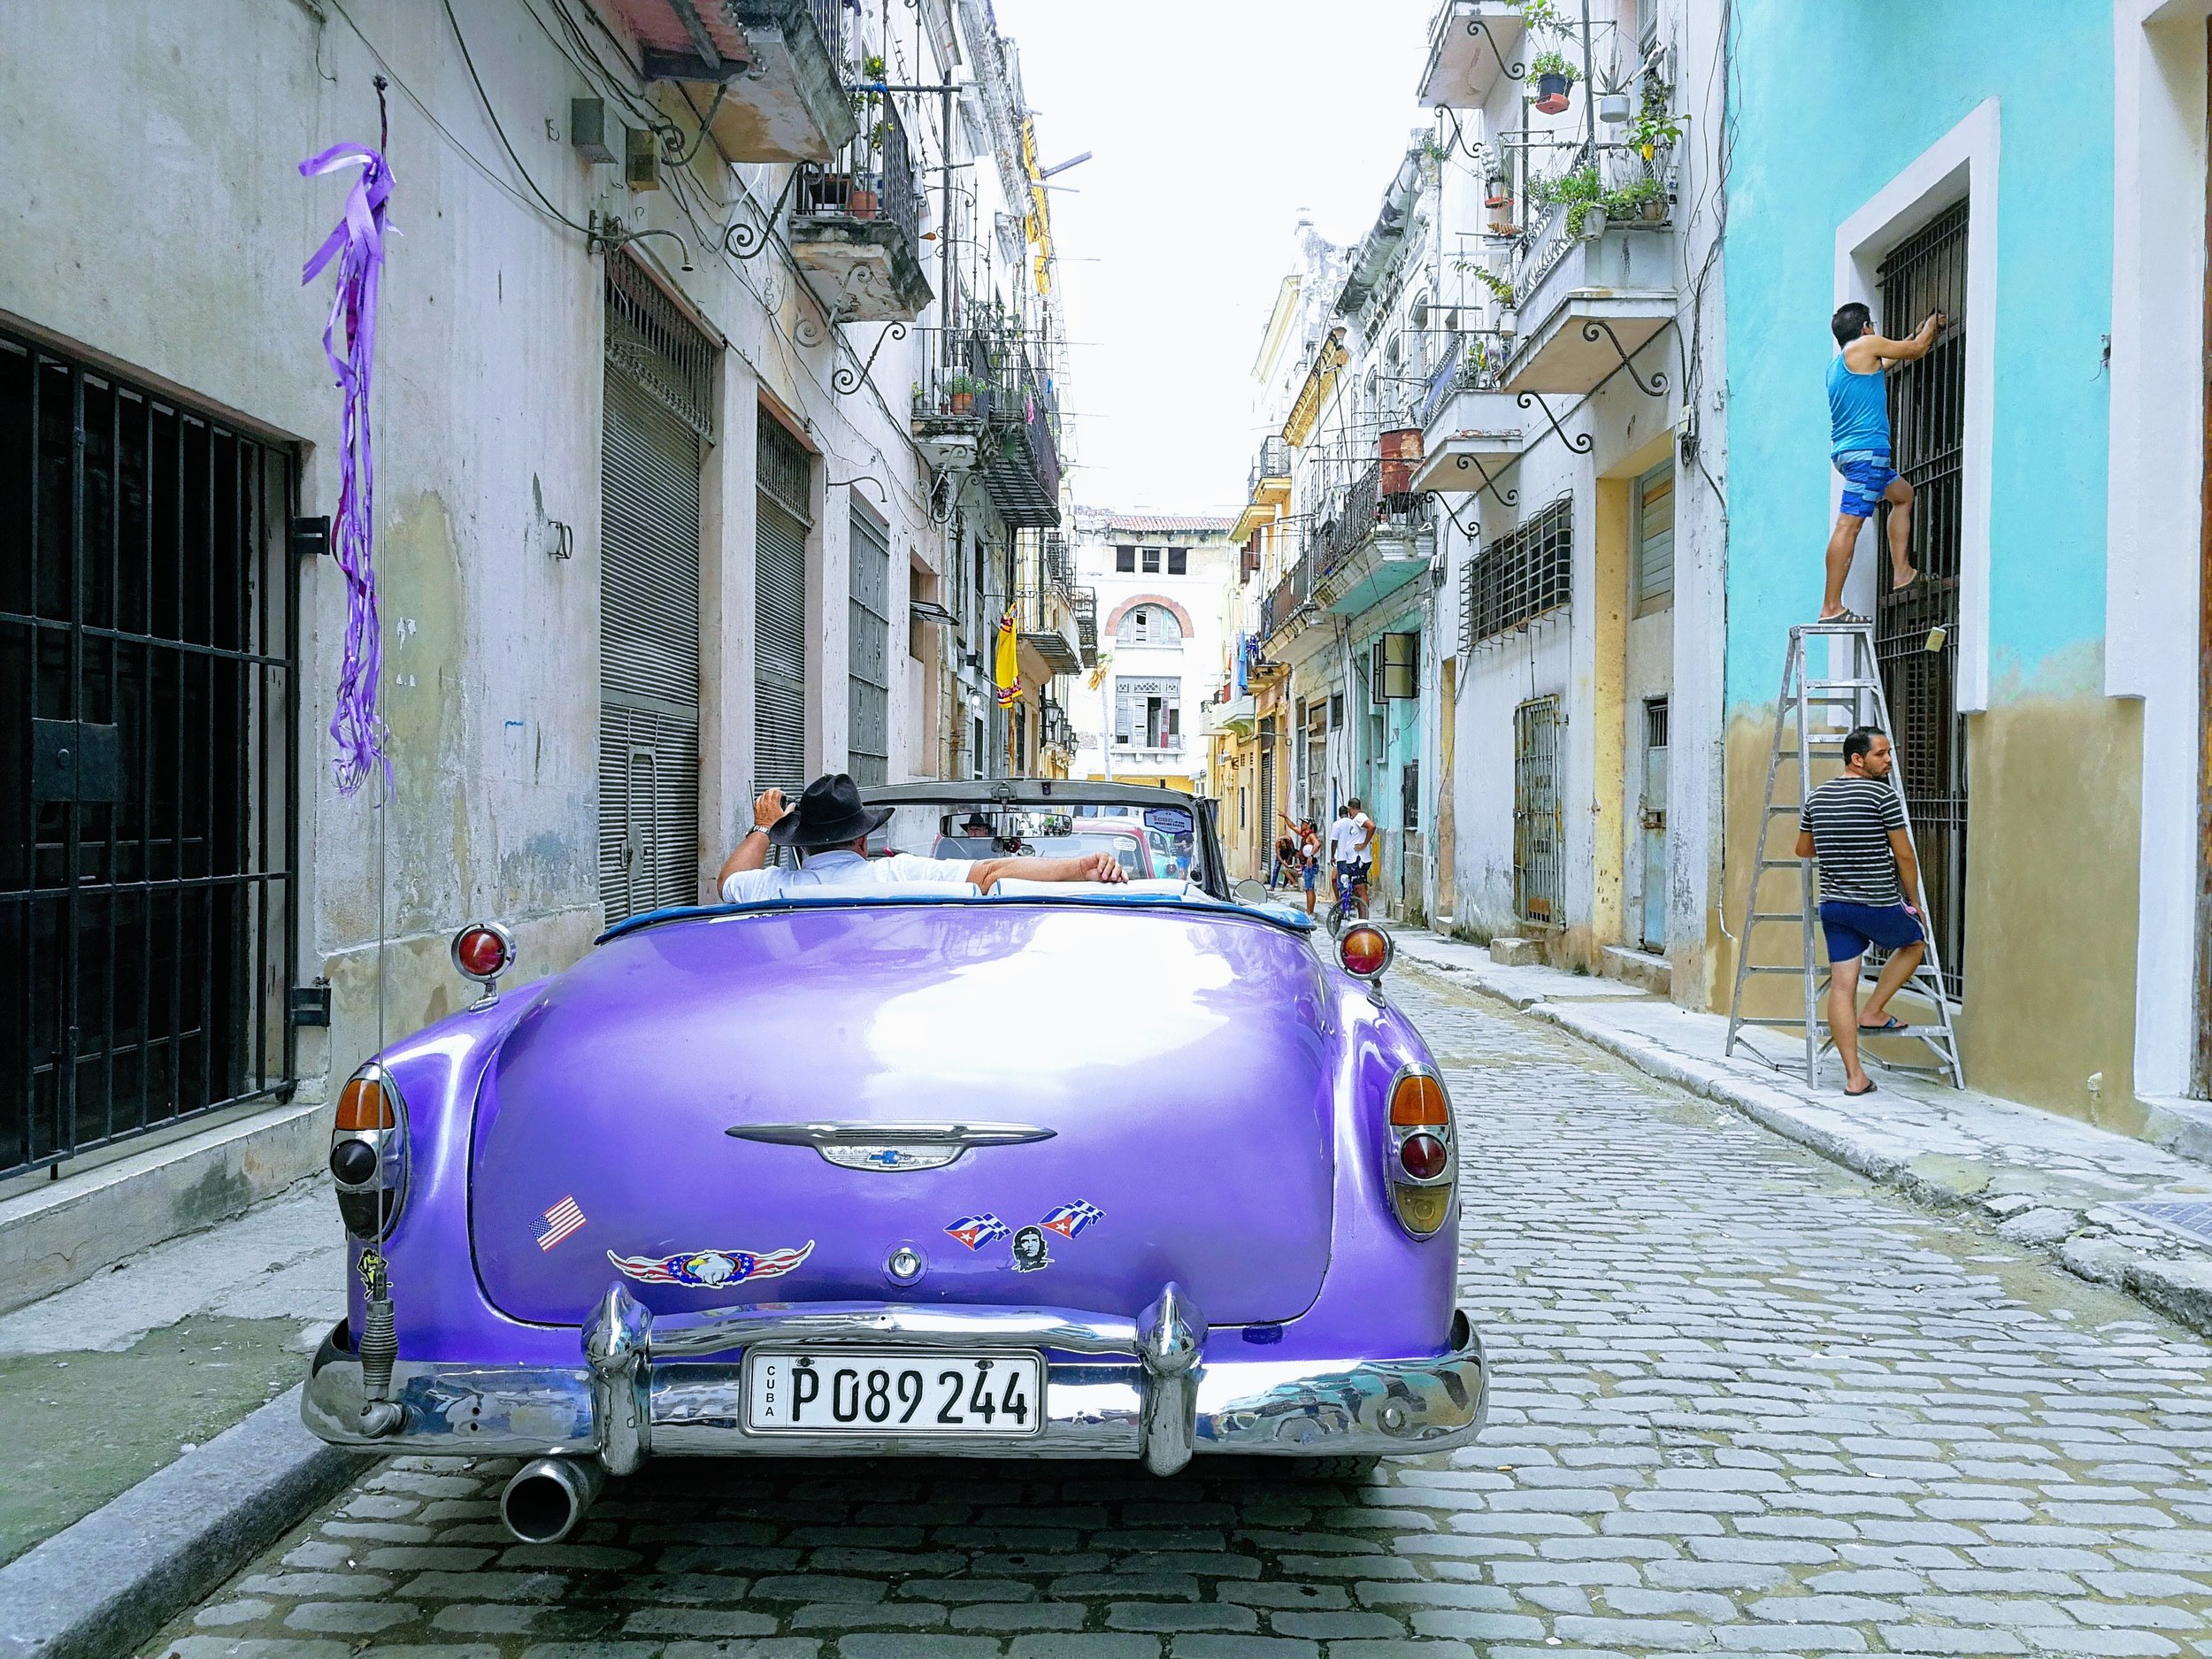 The streets of La Havana, November 2018